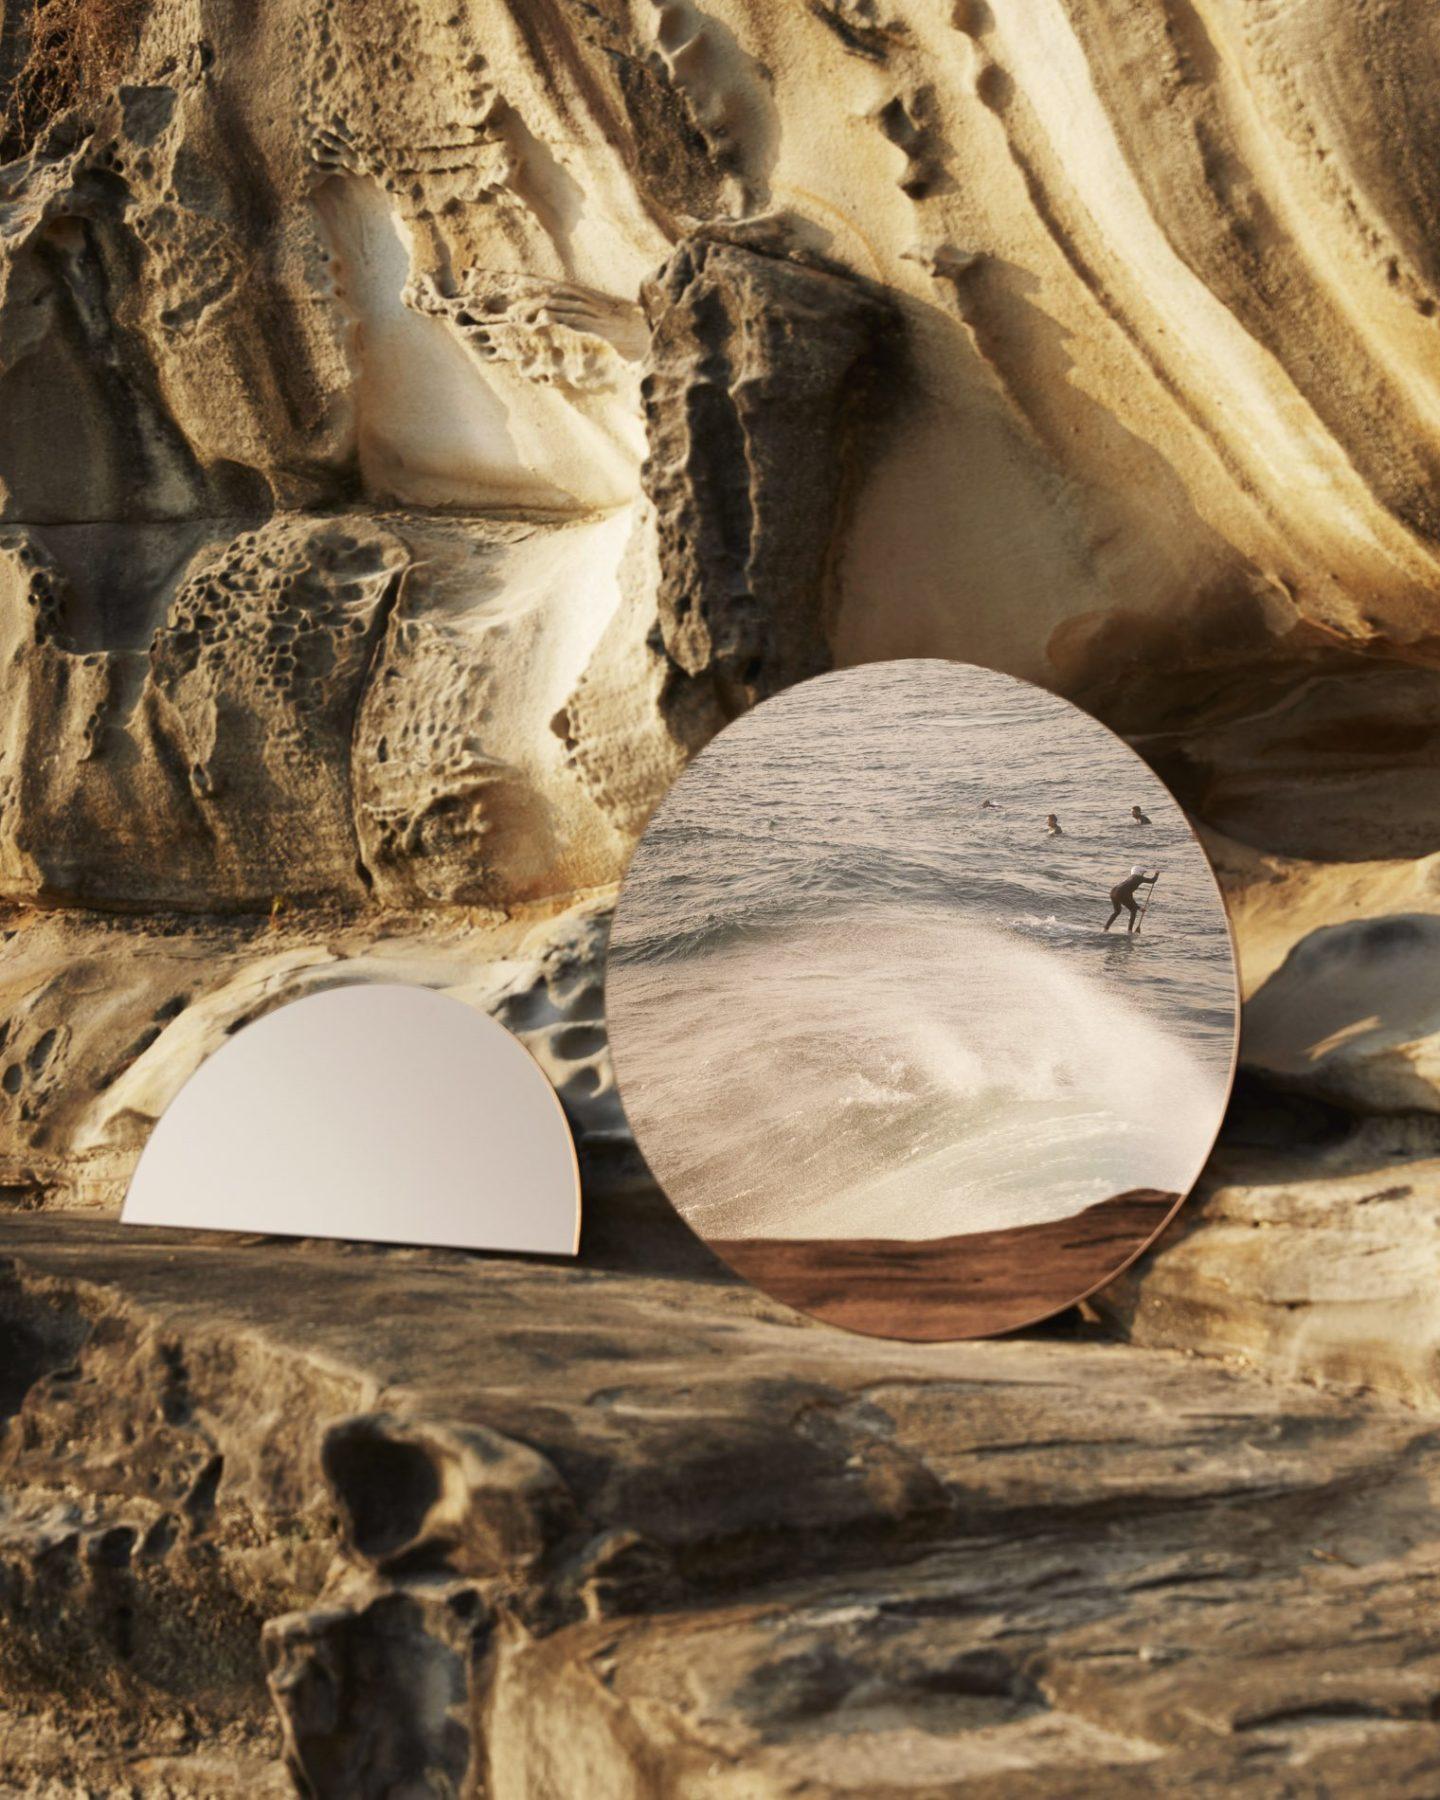 ignant-design-sarah-ellison-the-new-wave-006-1440x1800